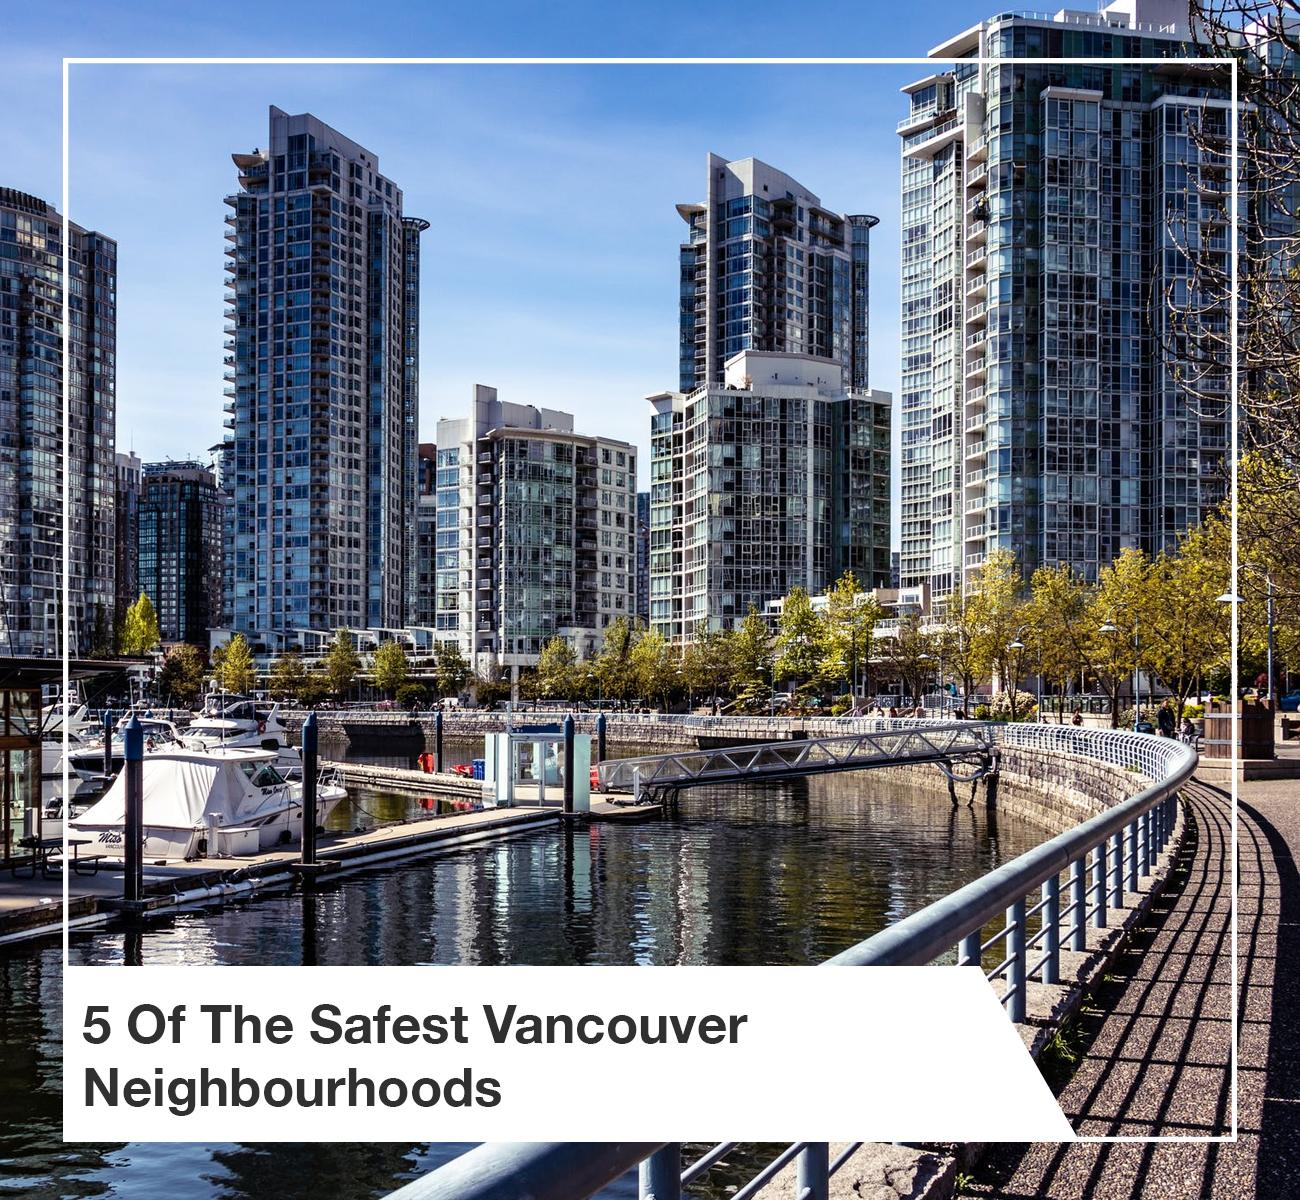 5 Safest Vancouver Neighbourhoods